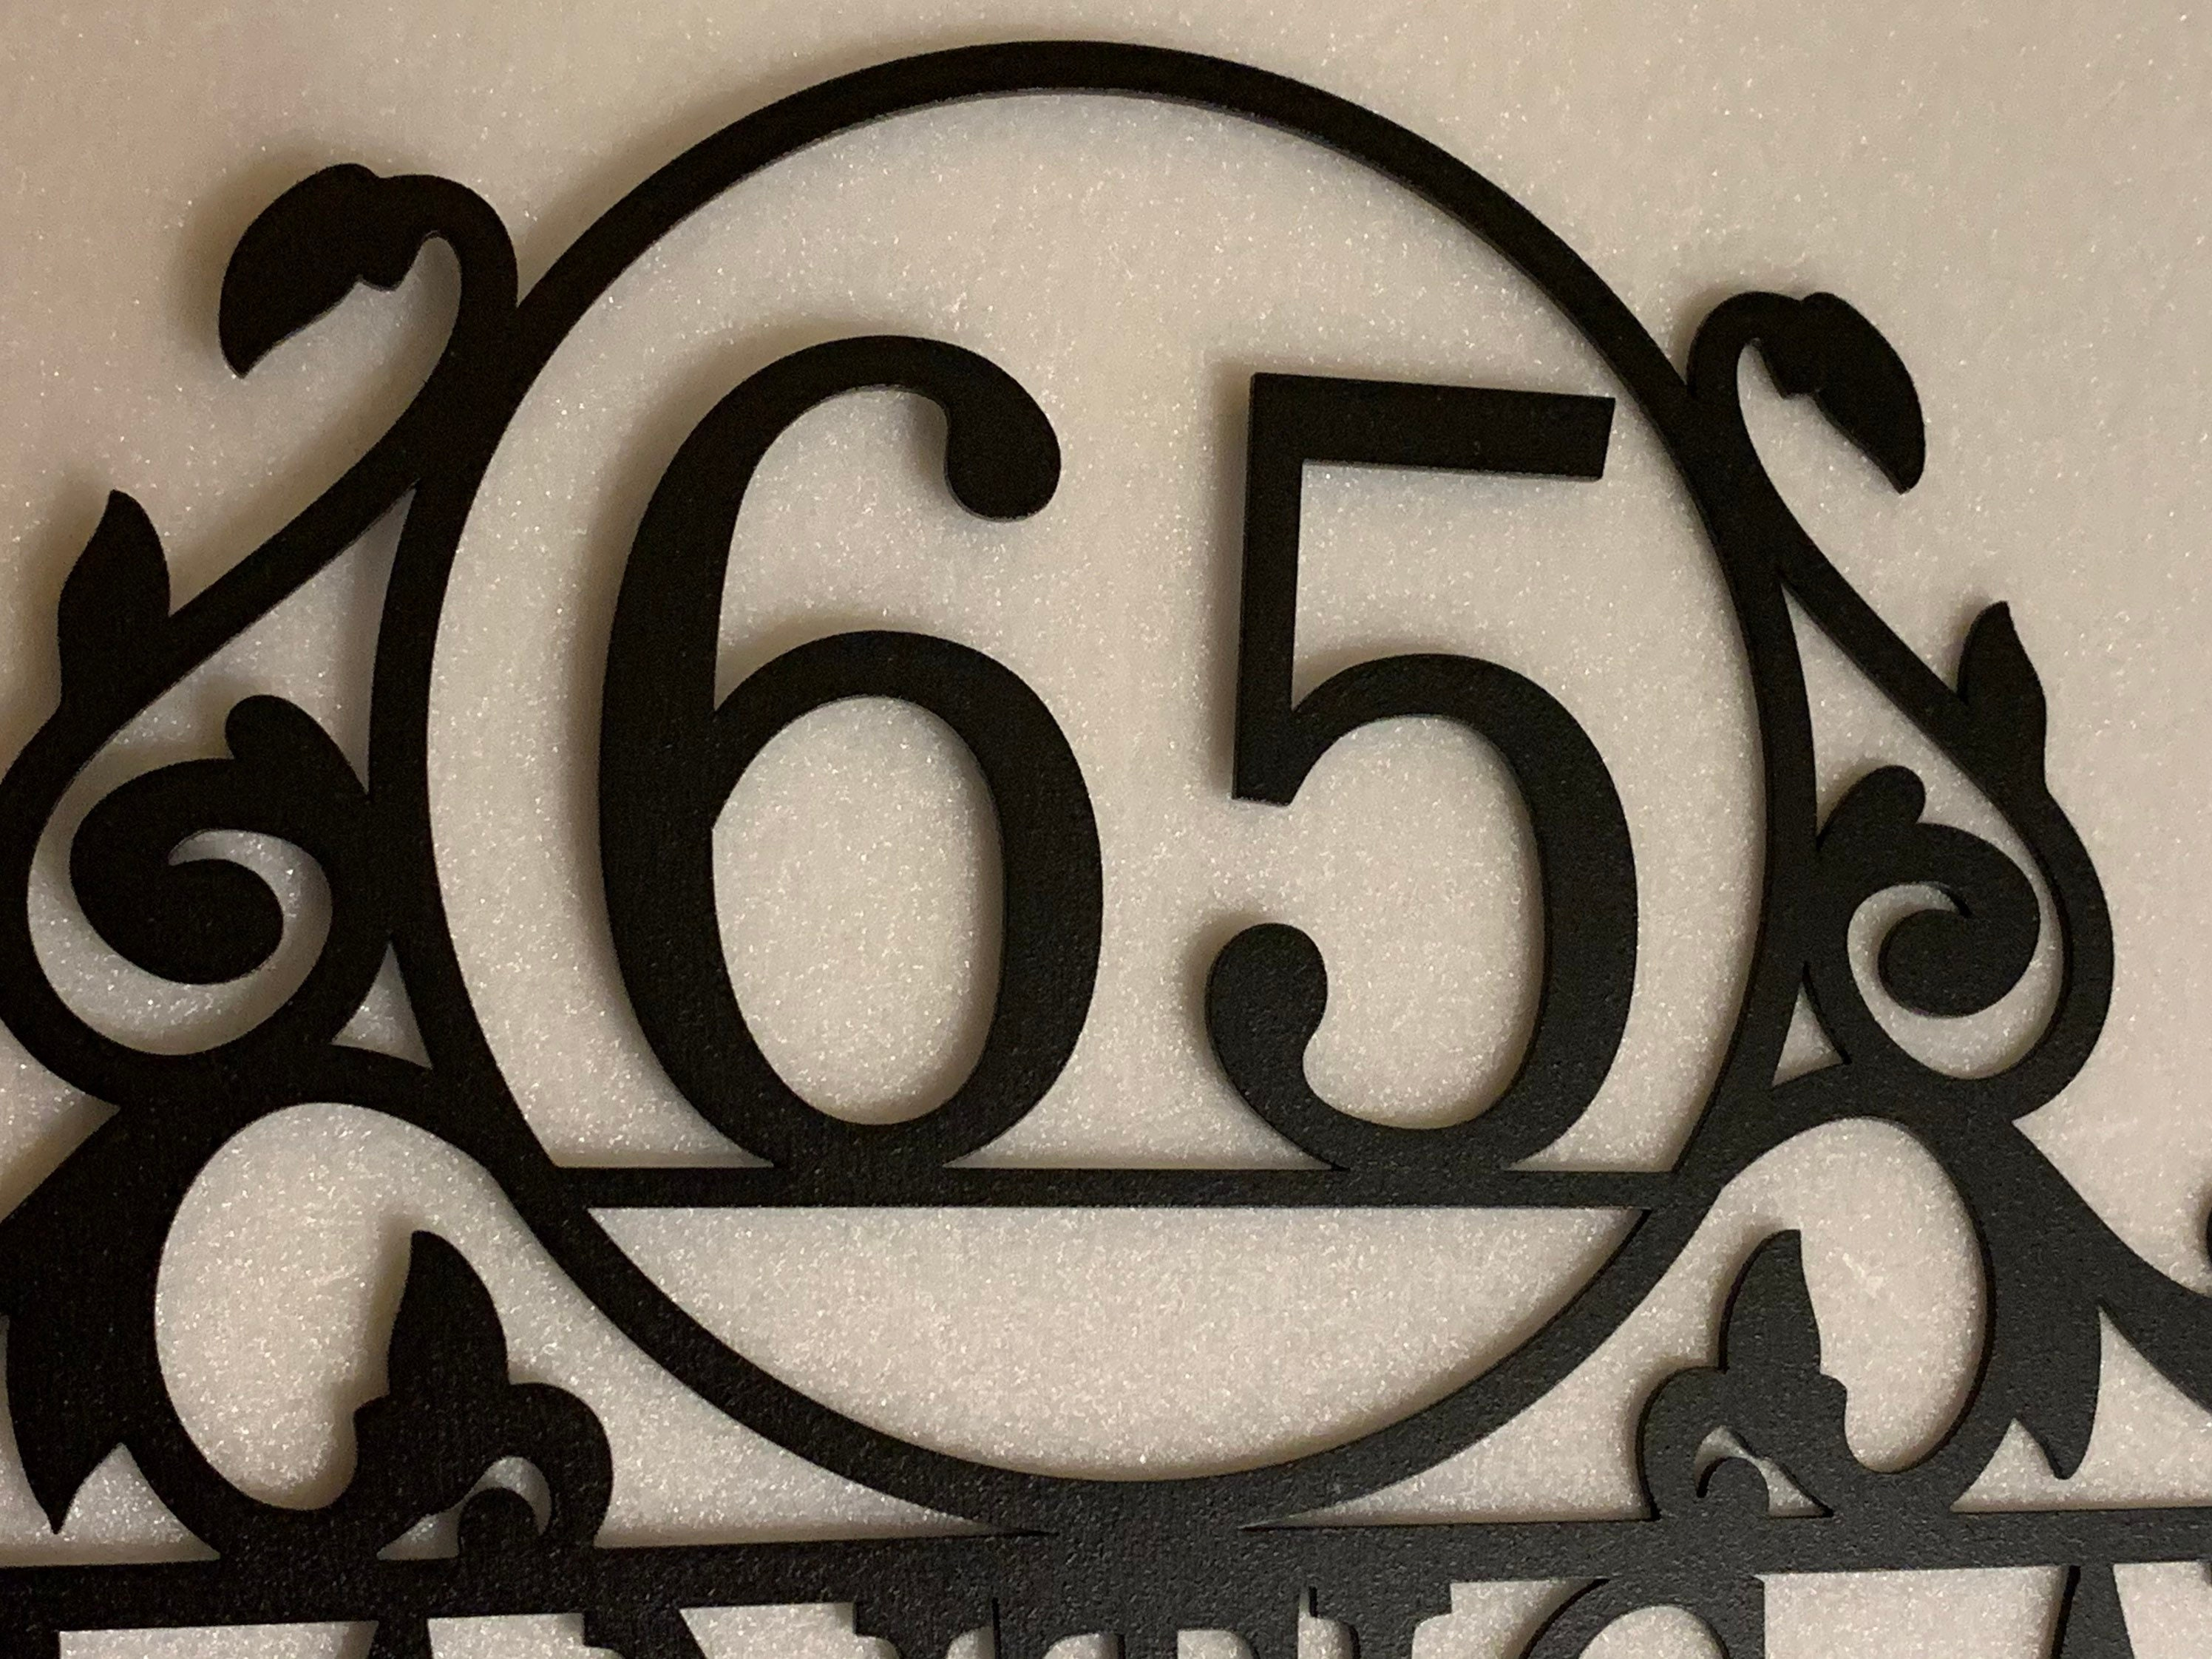 Metal Address Sign Custom Address Sign House Numbers Custom Address Plaque Address Sign 14 Inch Tiukiu Personalized Metal Wall Decor